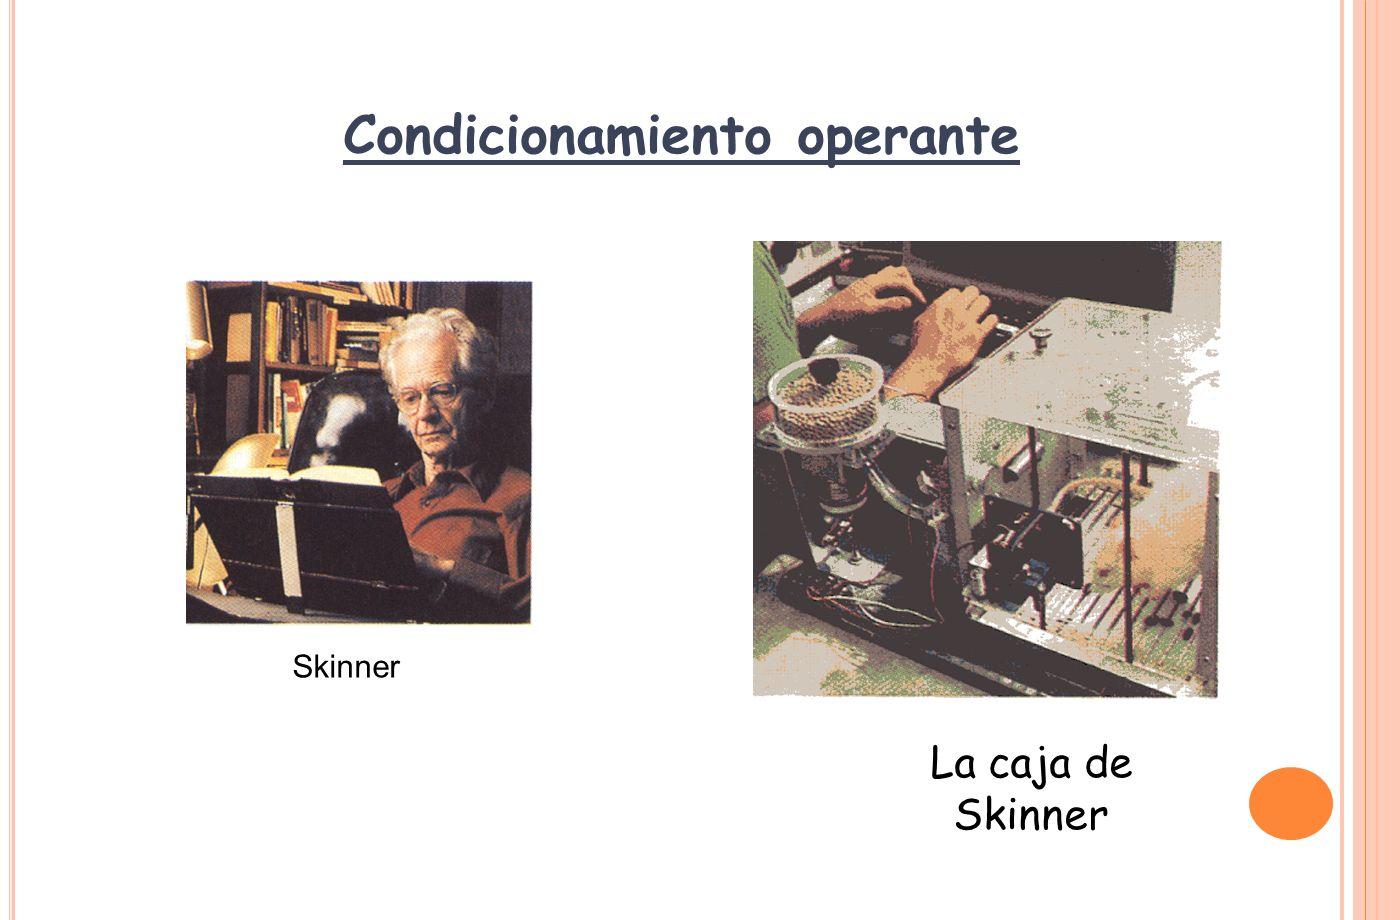 CONDICIONAMIENTO OPERANTE B.F.Skinner (1904 - 1990) 1.